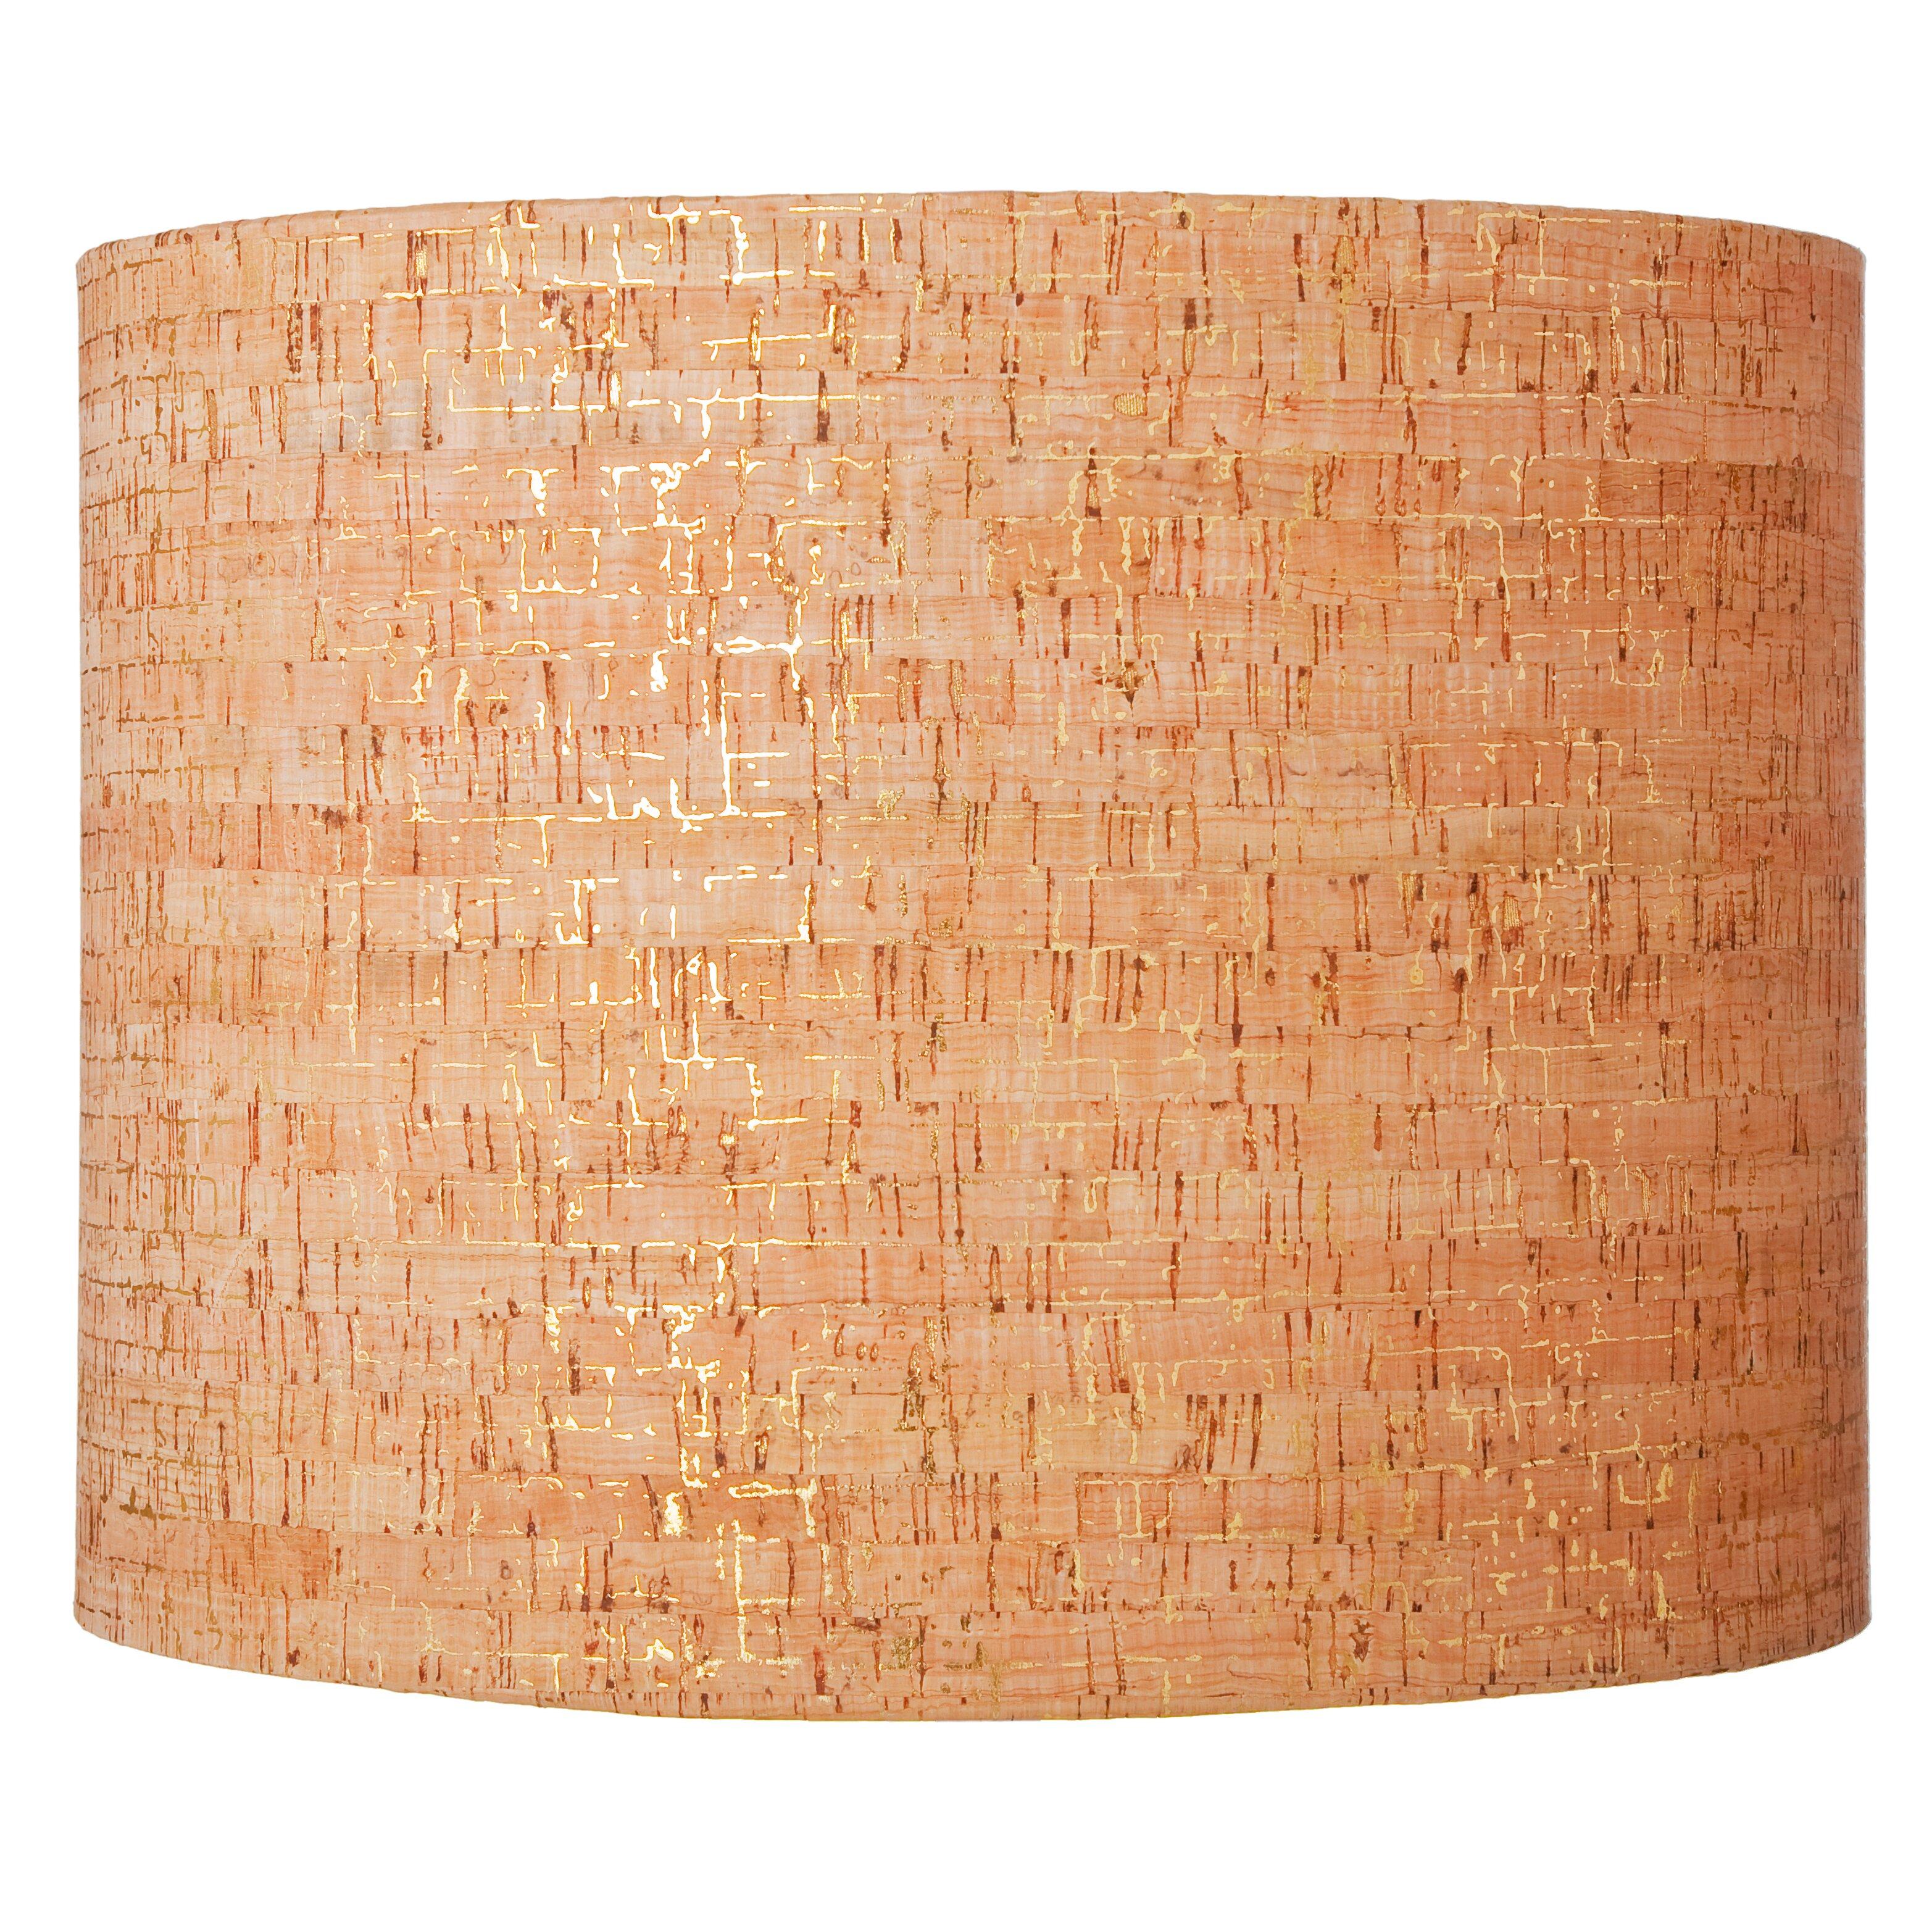 "Ls island hot Ziqi Home 16"" Natural Cork Drum Lamp Shade"